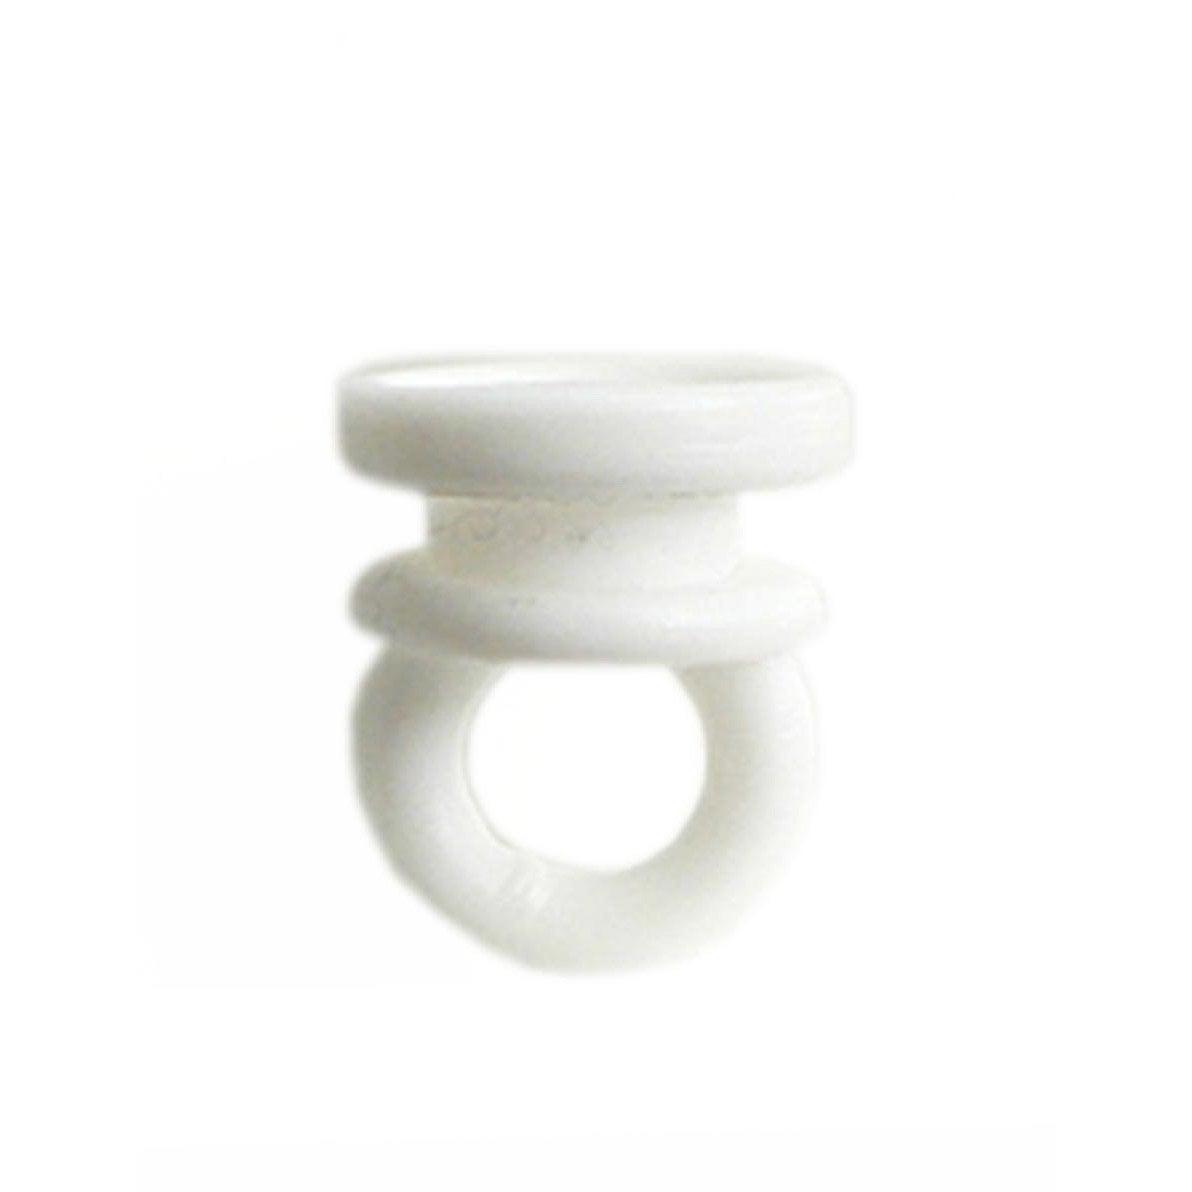 lot de 10 curseurs en plastique blanc bi rail l 2 cm leroy merlin. Black Bedroom Furniture Sets. Home Design Ideas